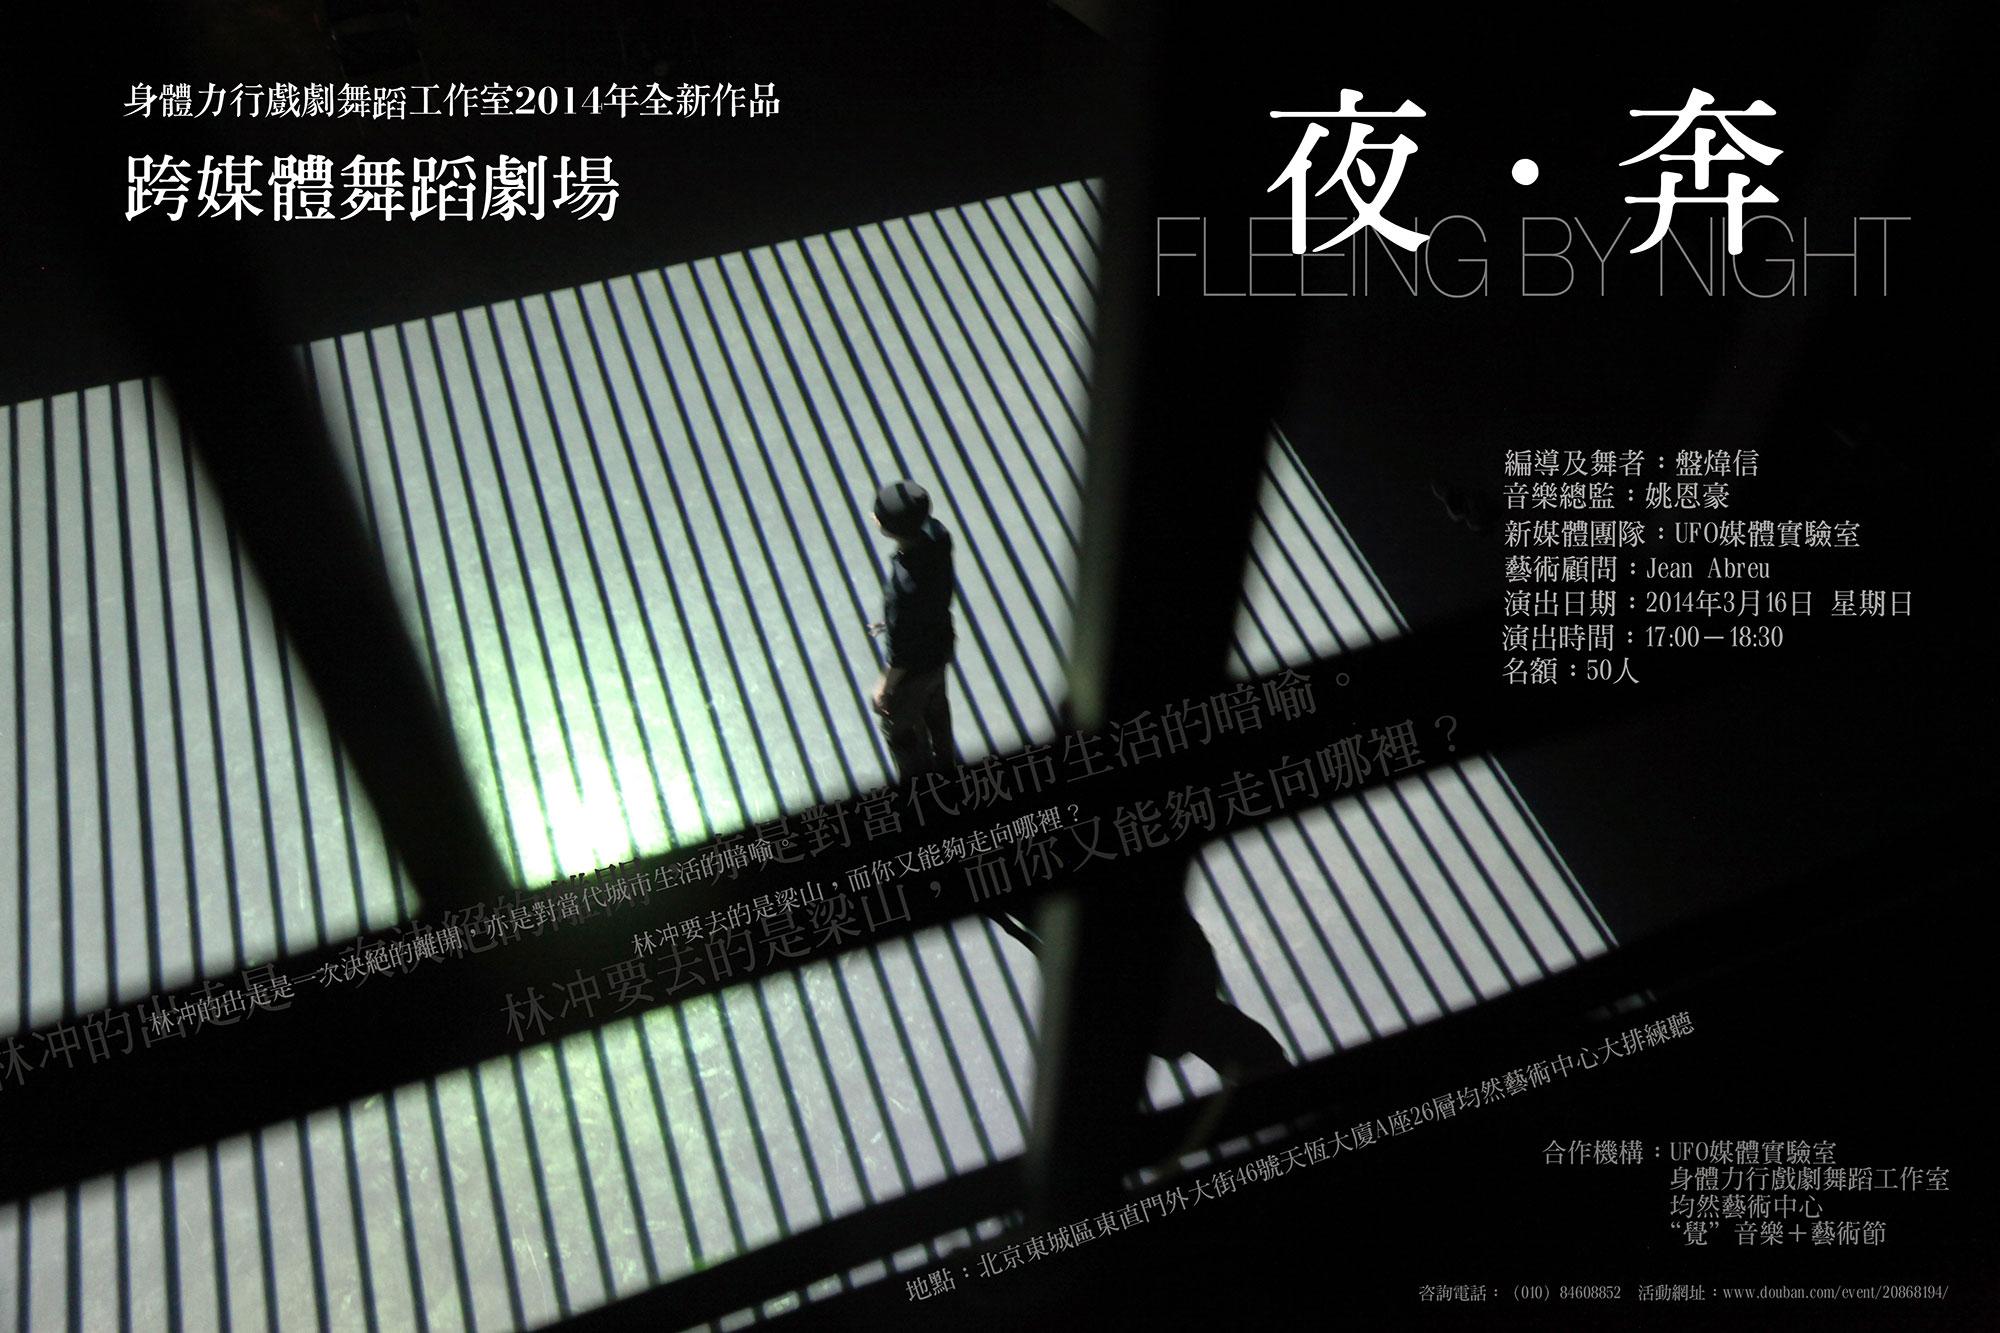 Fleeing-By-Night-web60-01